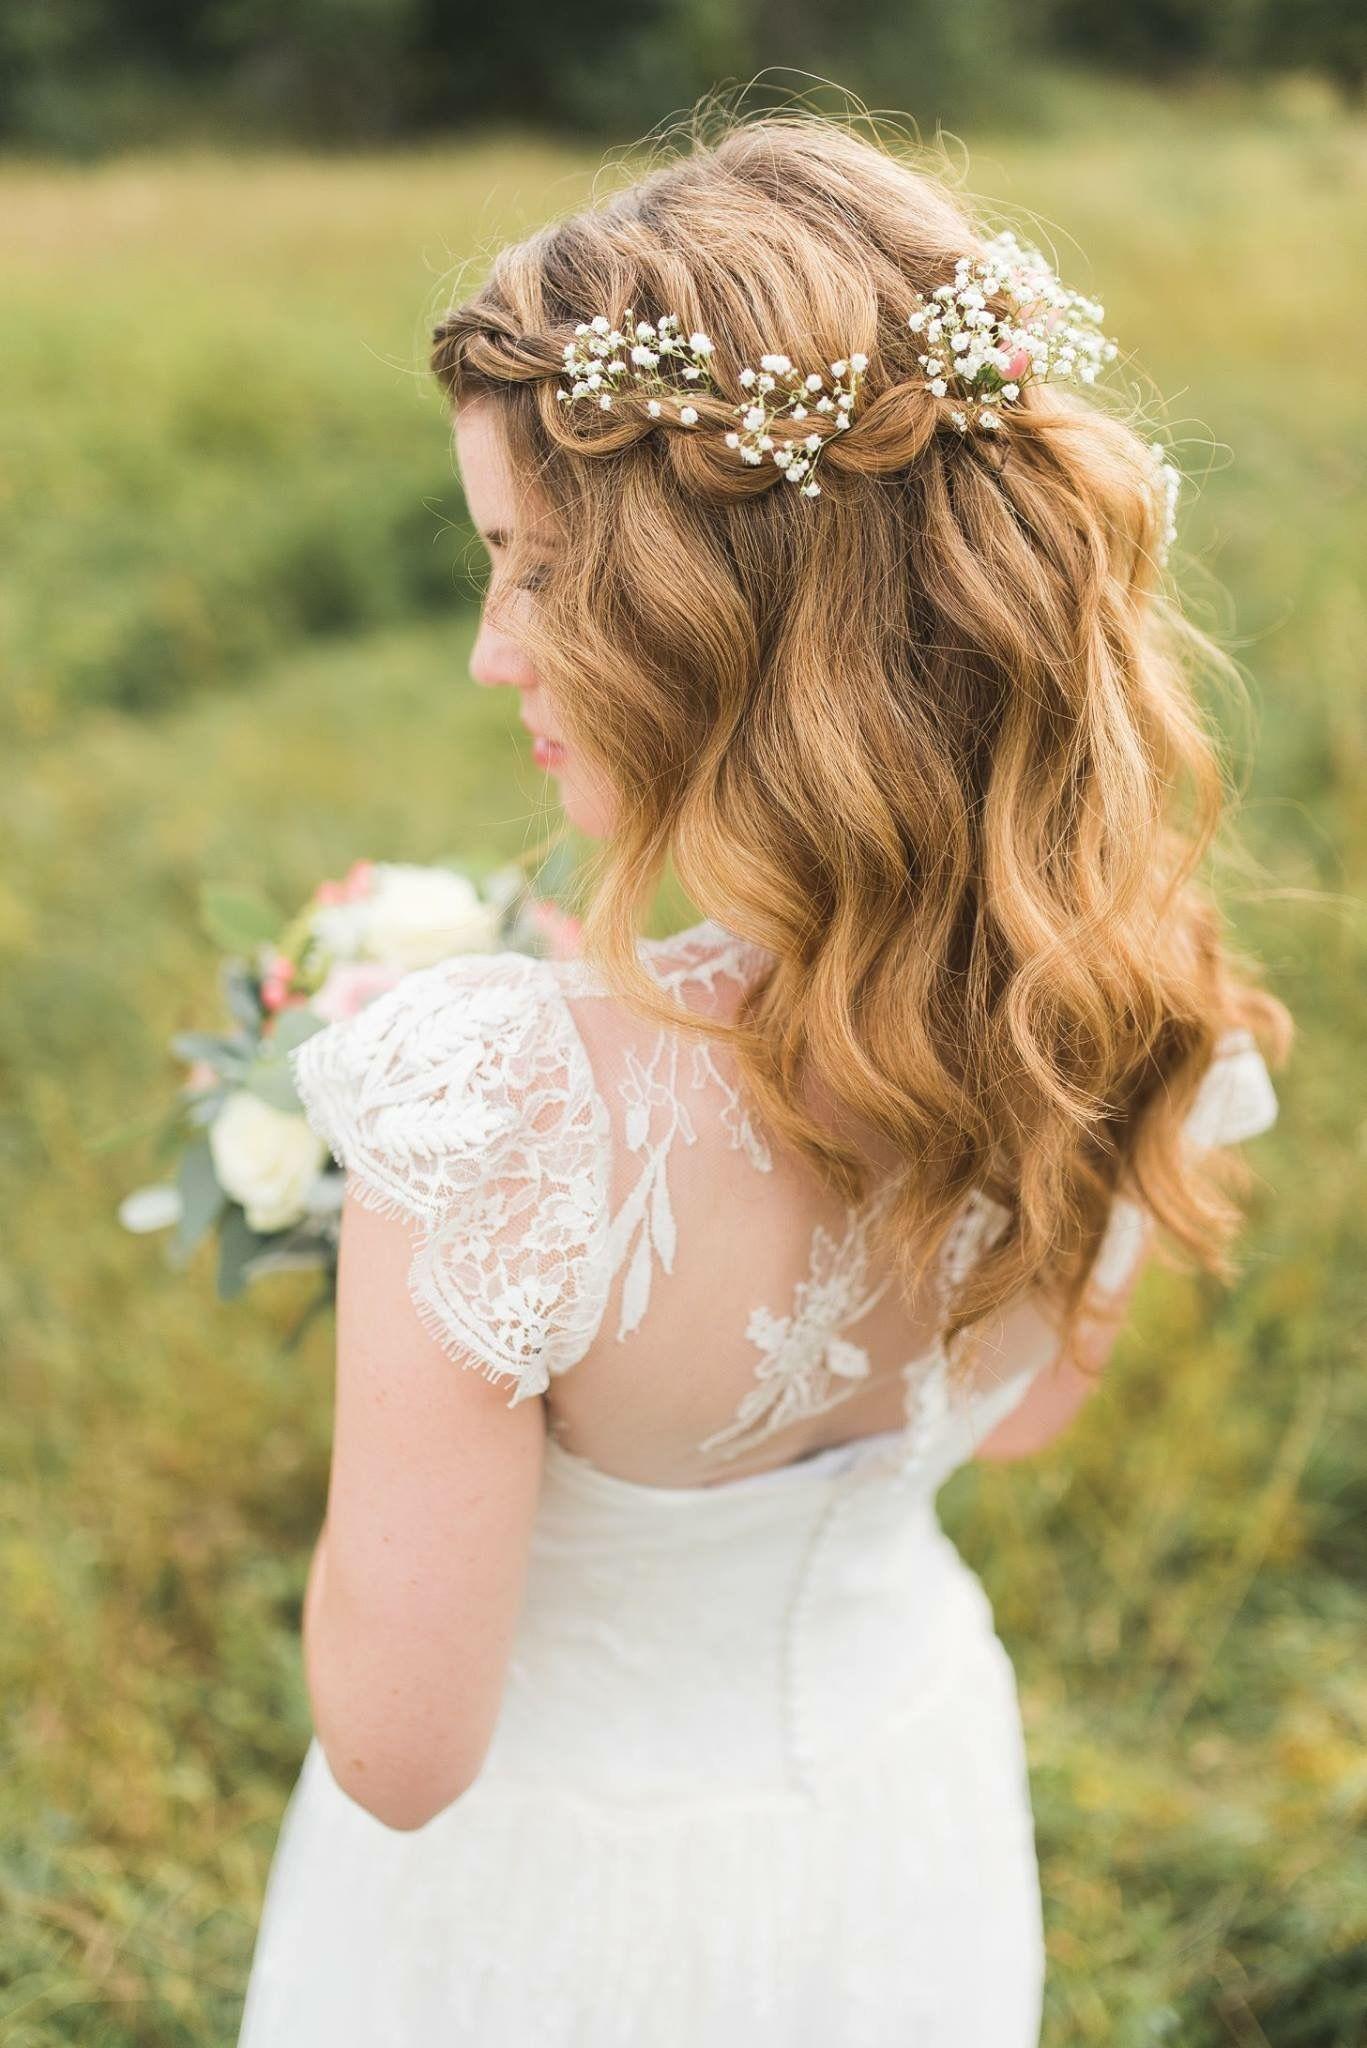 Epingle Par Melodie Villy Sur Weddings Coiffure Mariage Coiffure Mariage